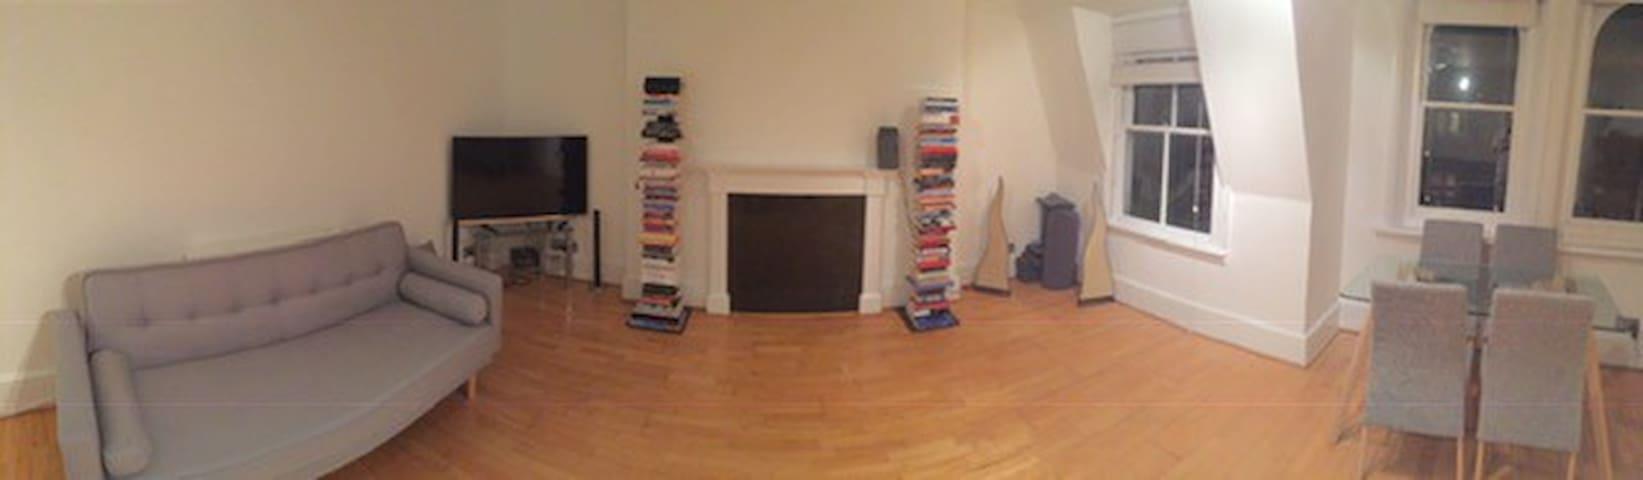 Living Room - Panorama